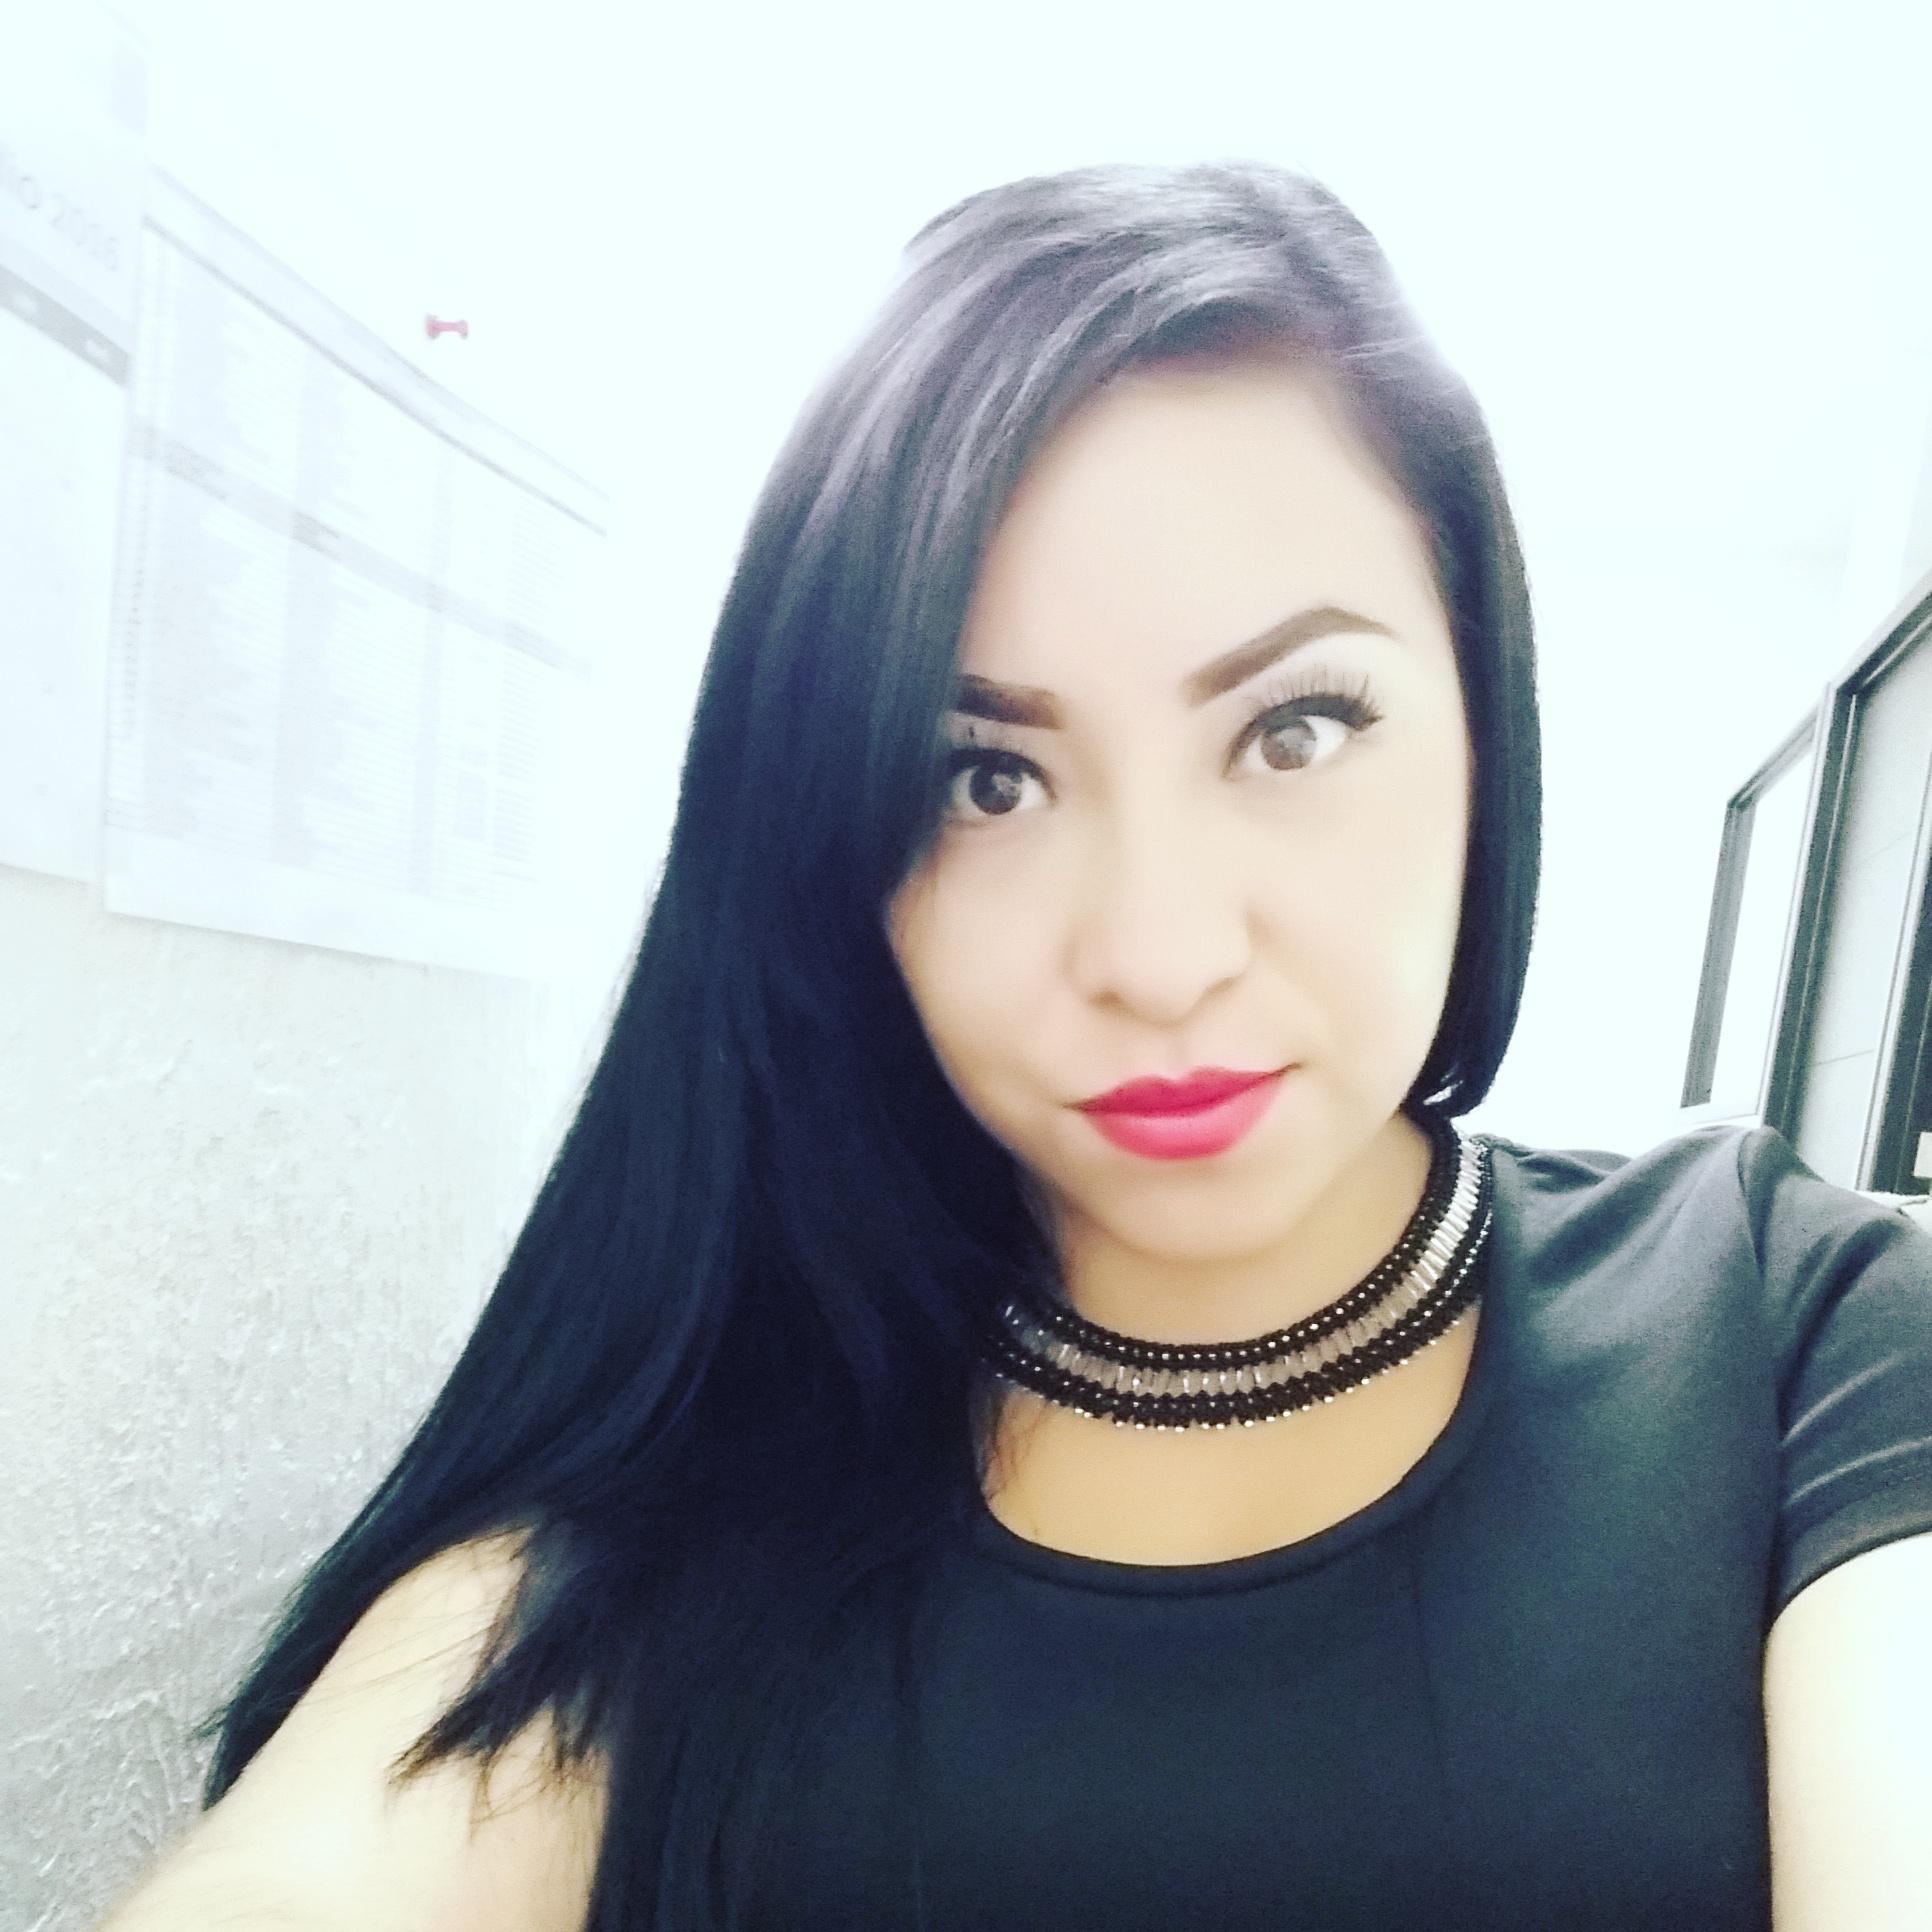 Perfil de Ahitanaviry Garcia